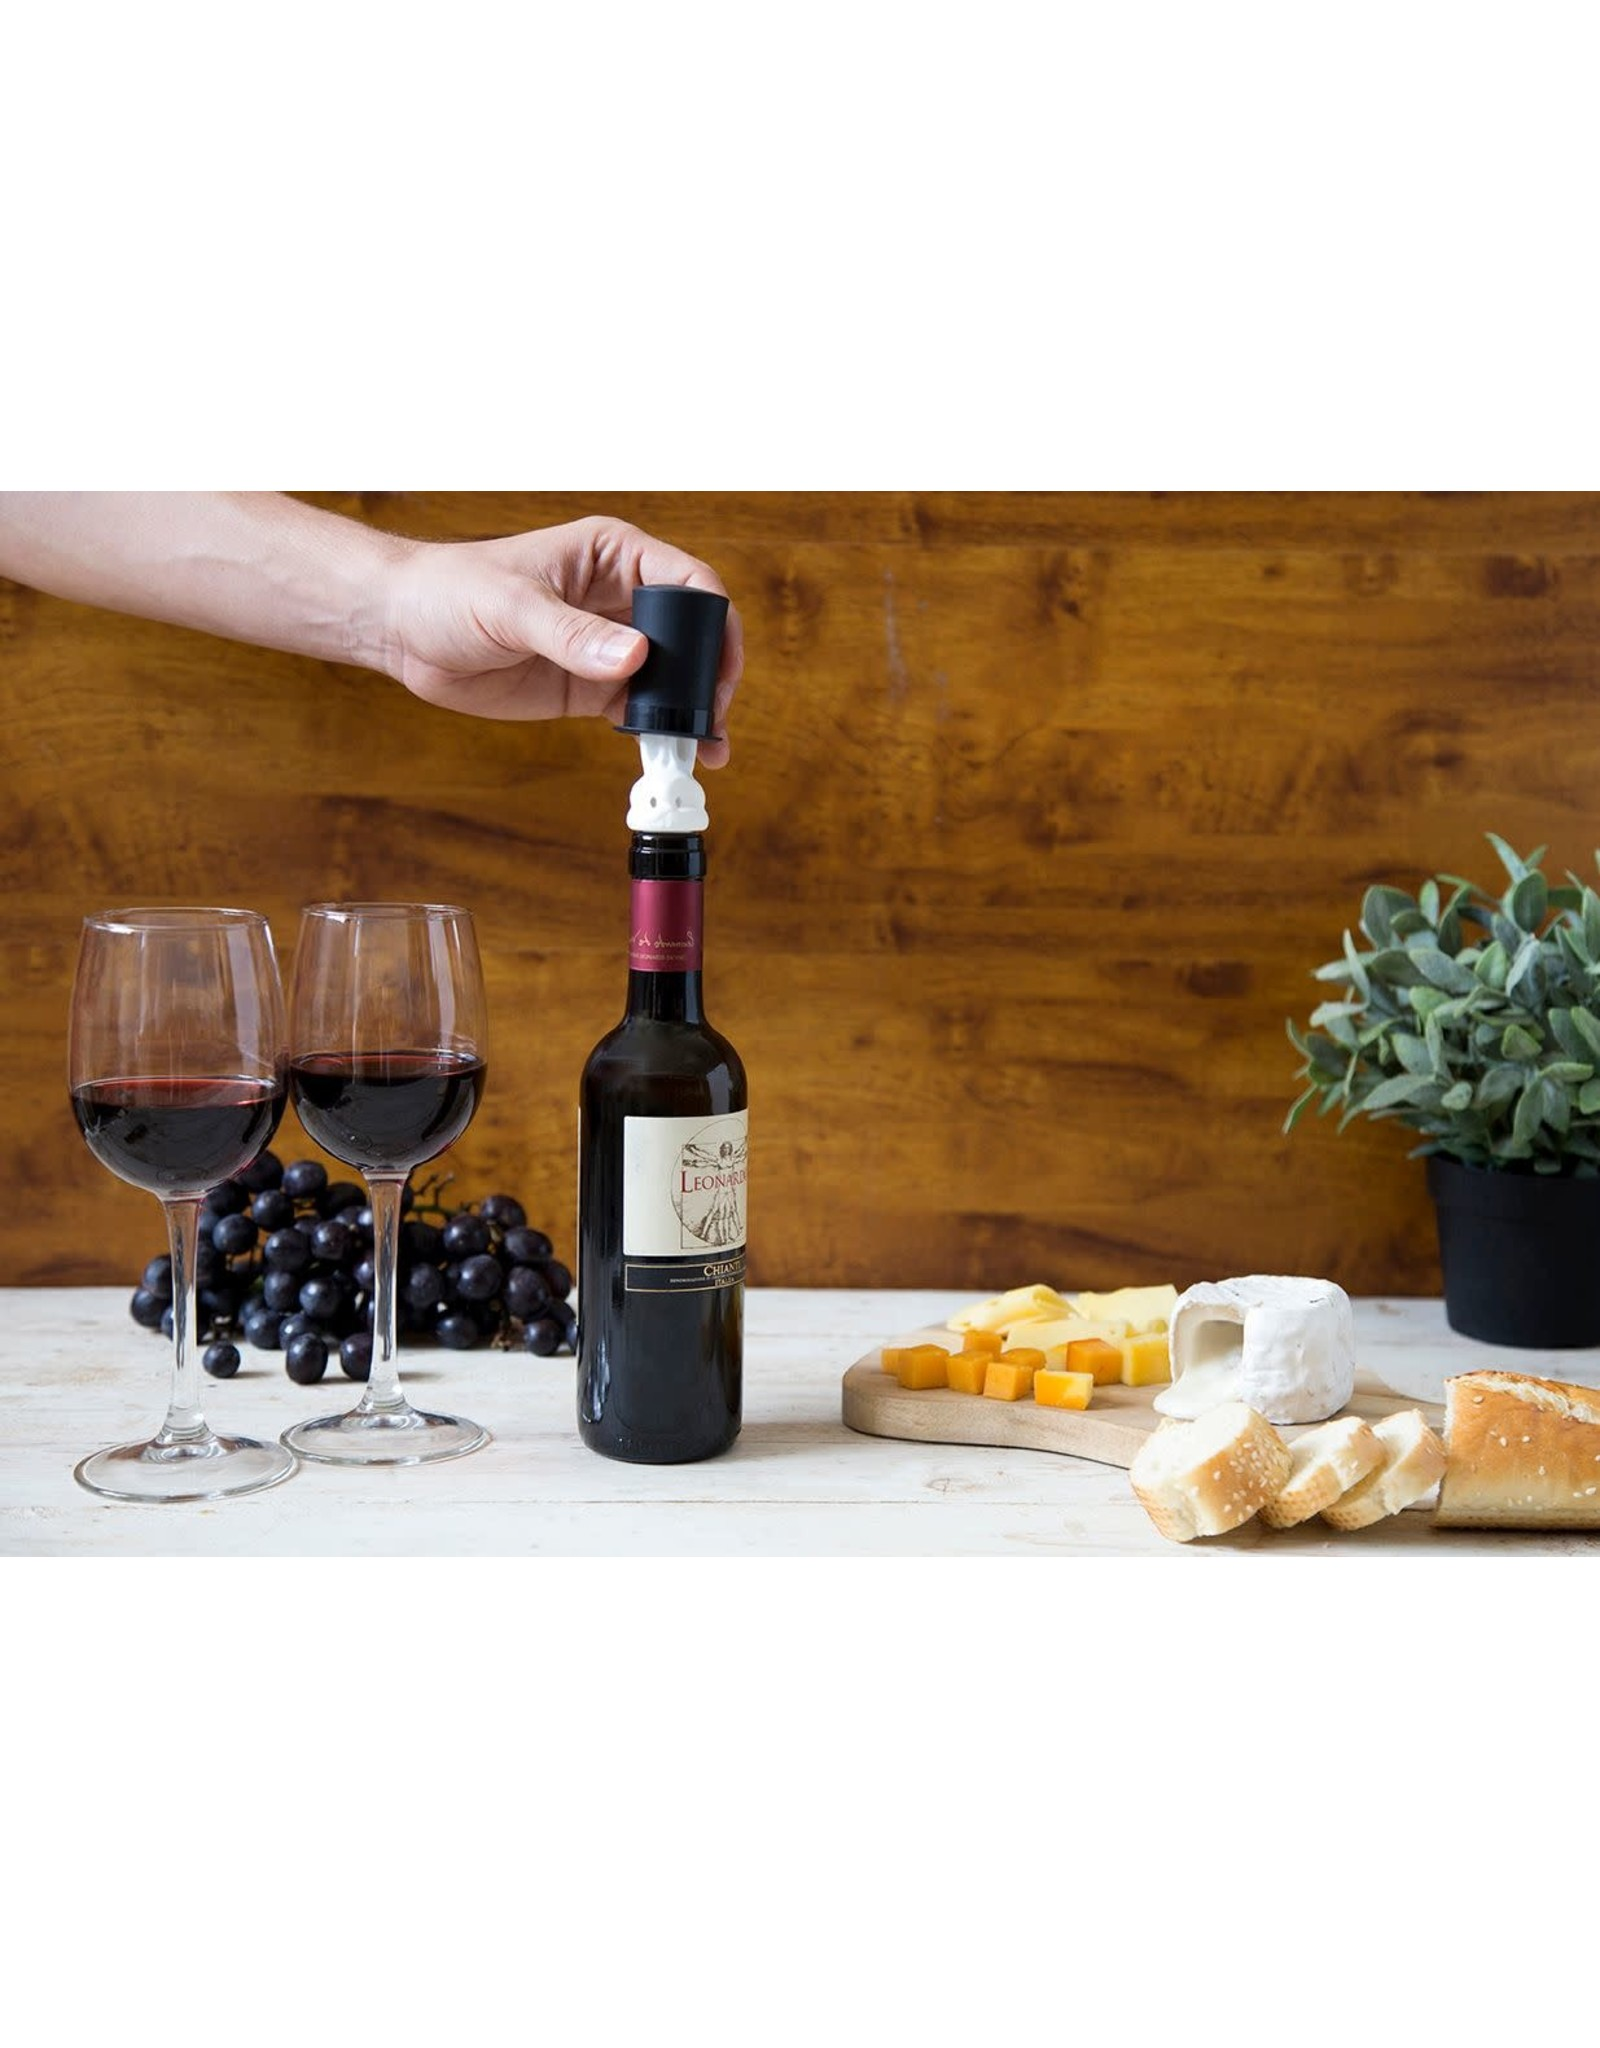 Peleg Design bottle stopper and wine pourer - hat and rabbit - Barney